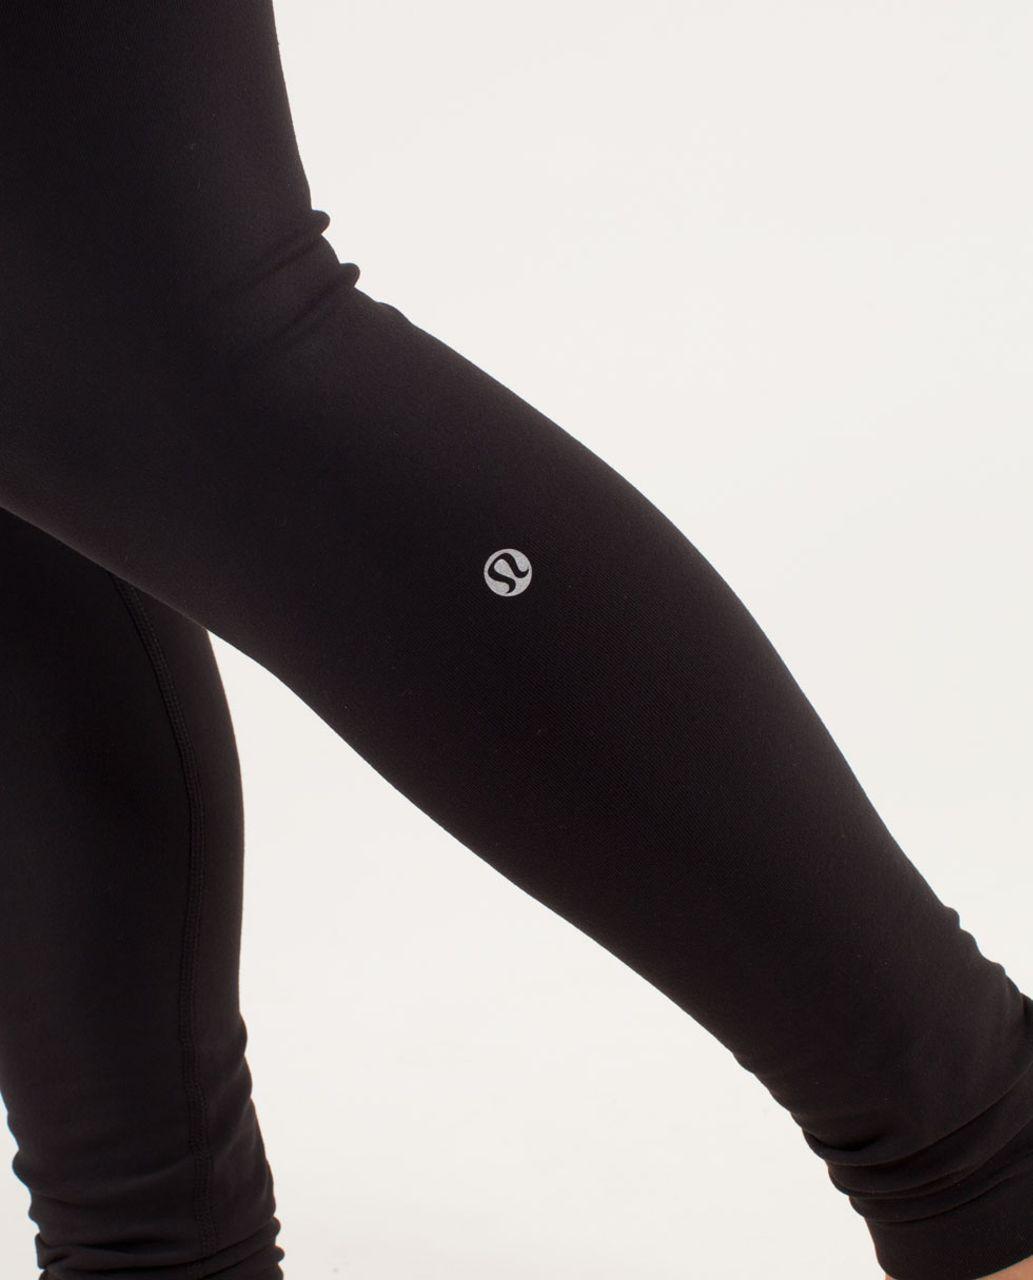 Lululemon Wunder Under Pant *Reversible - Black / Transition Fall 12 Quilt 30